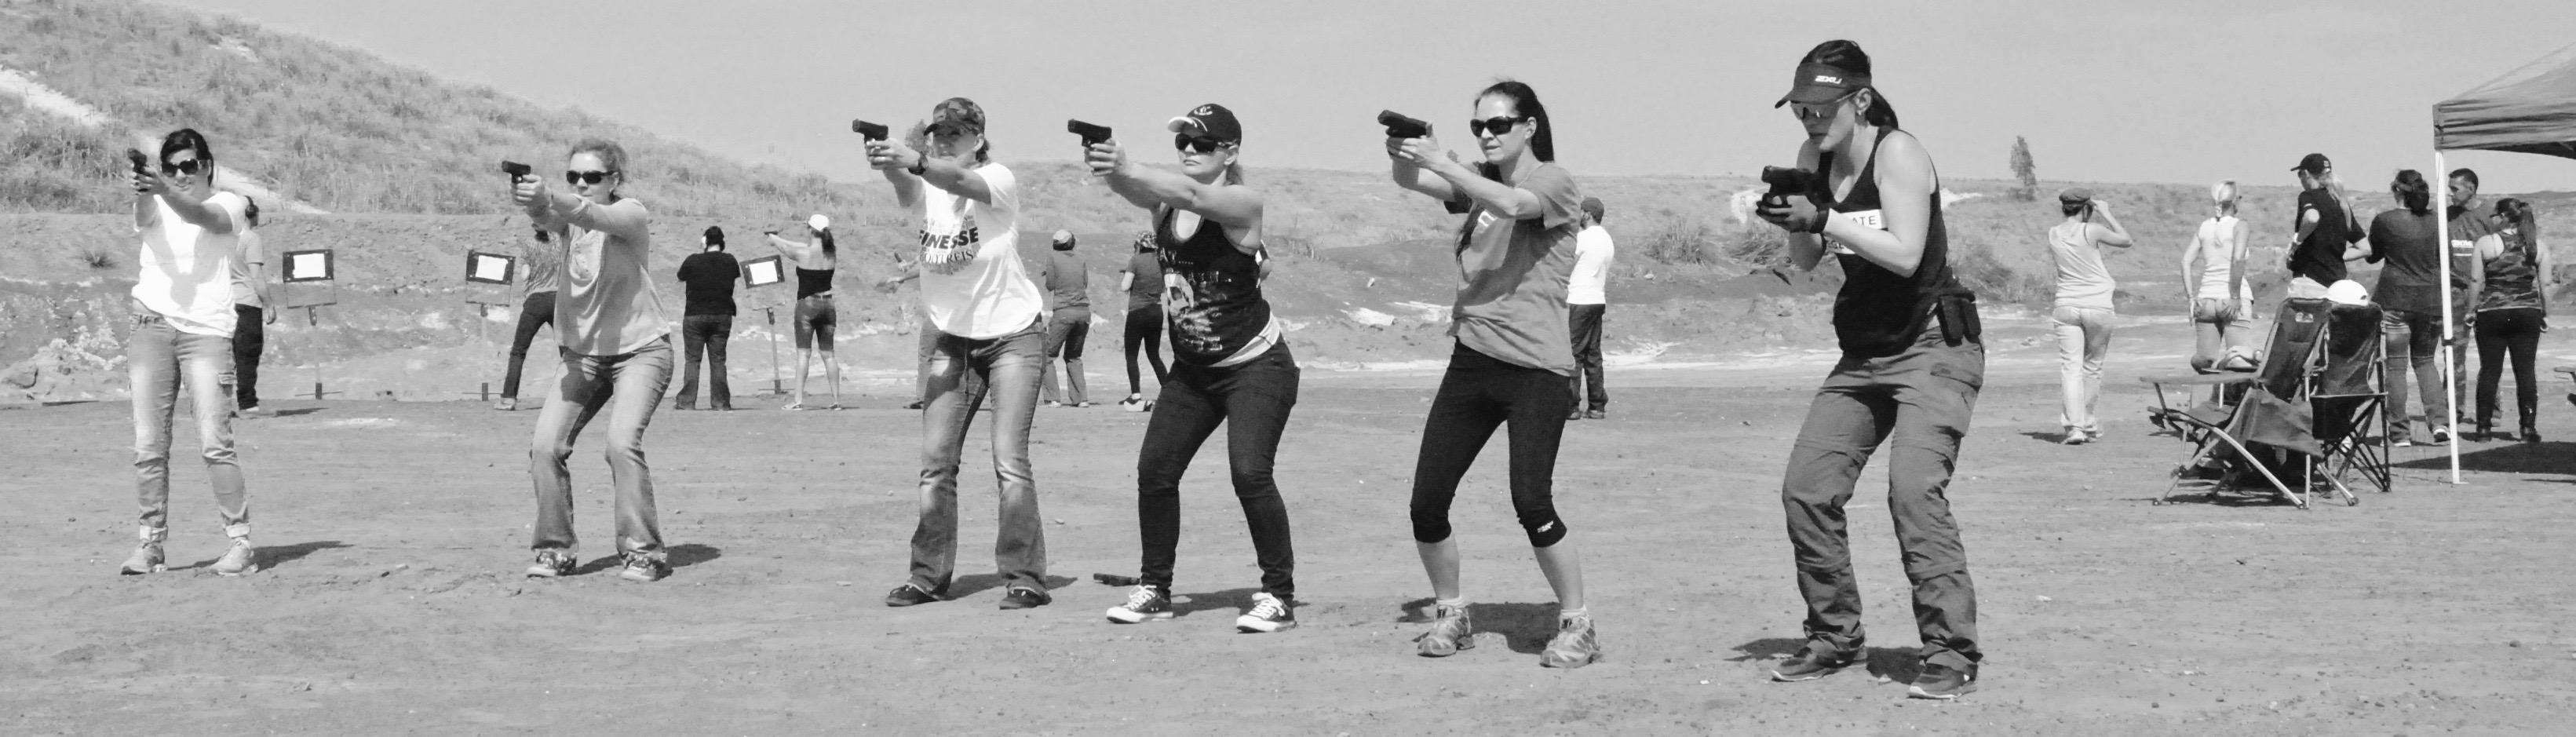 Women self defense training